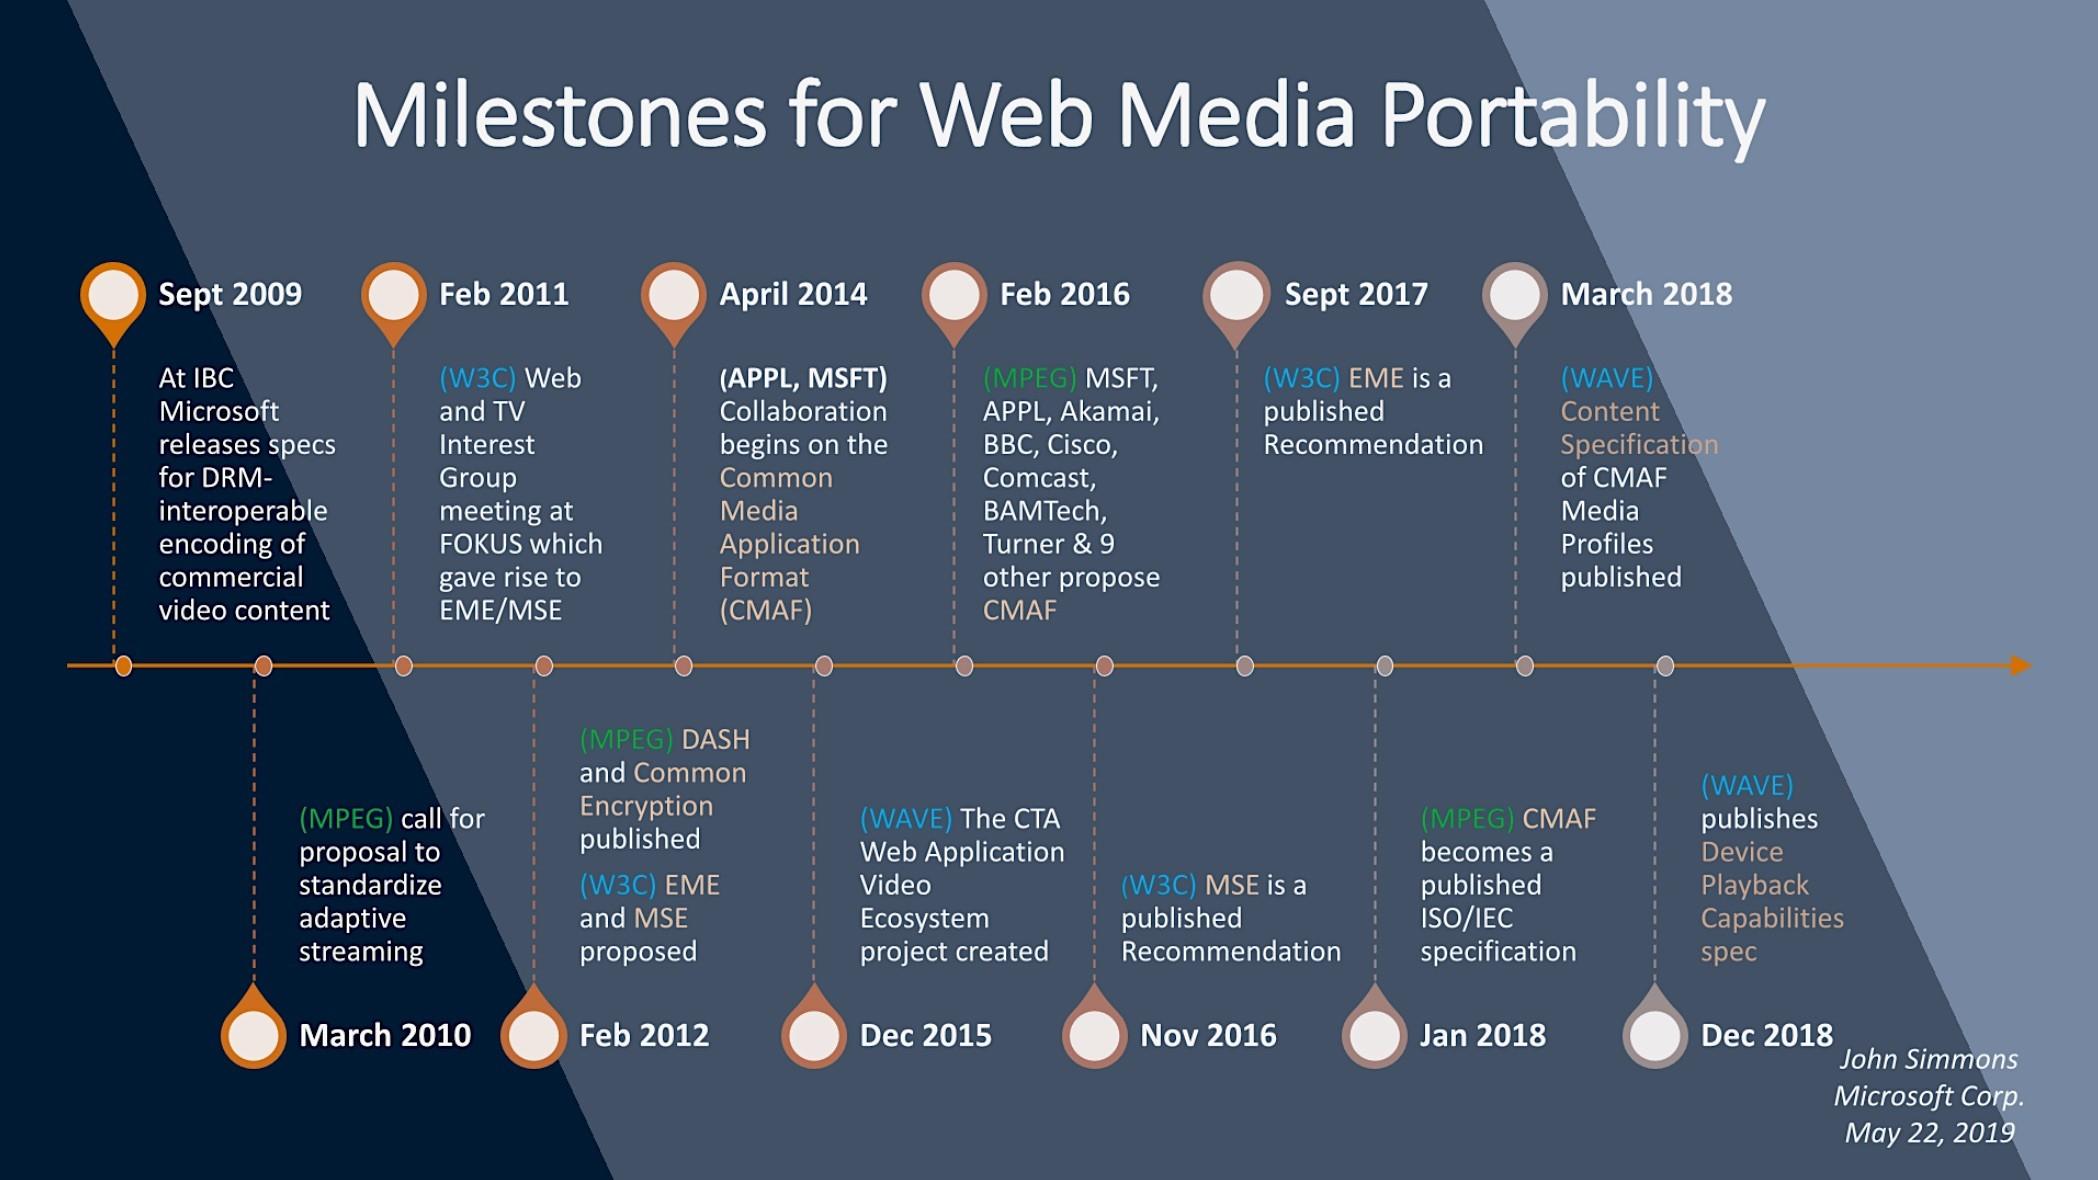 Milestones for Web Media Portability